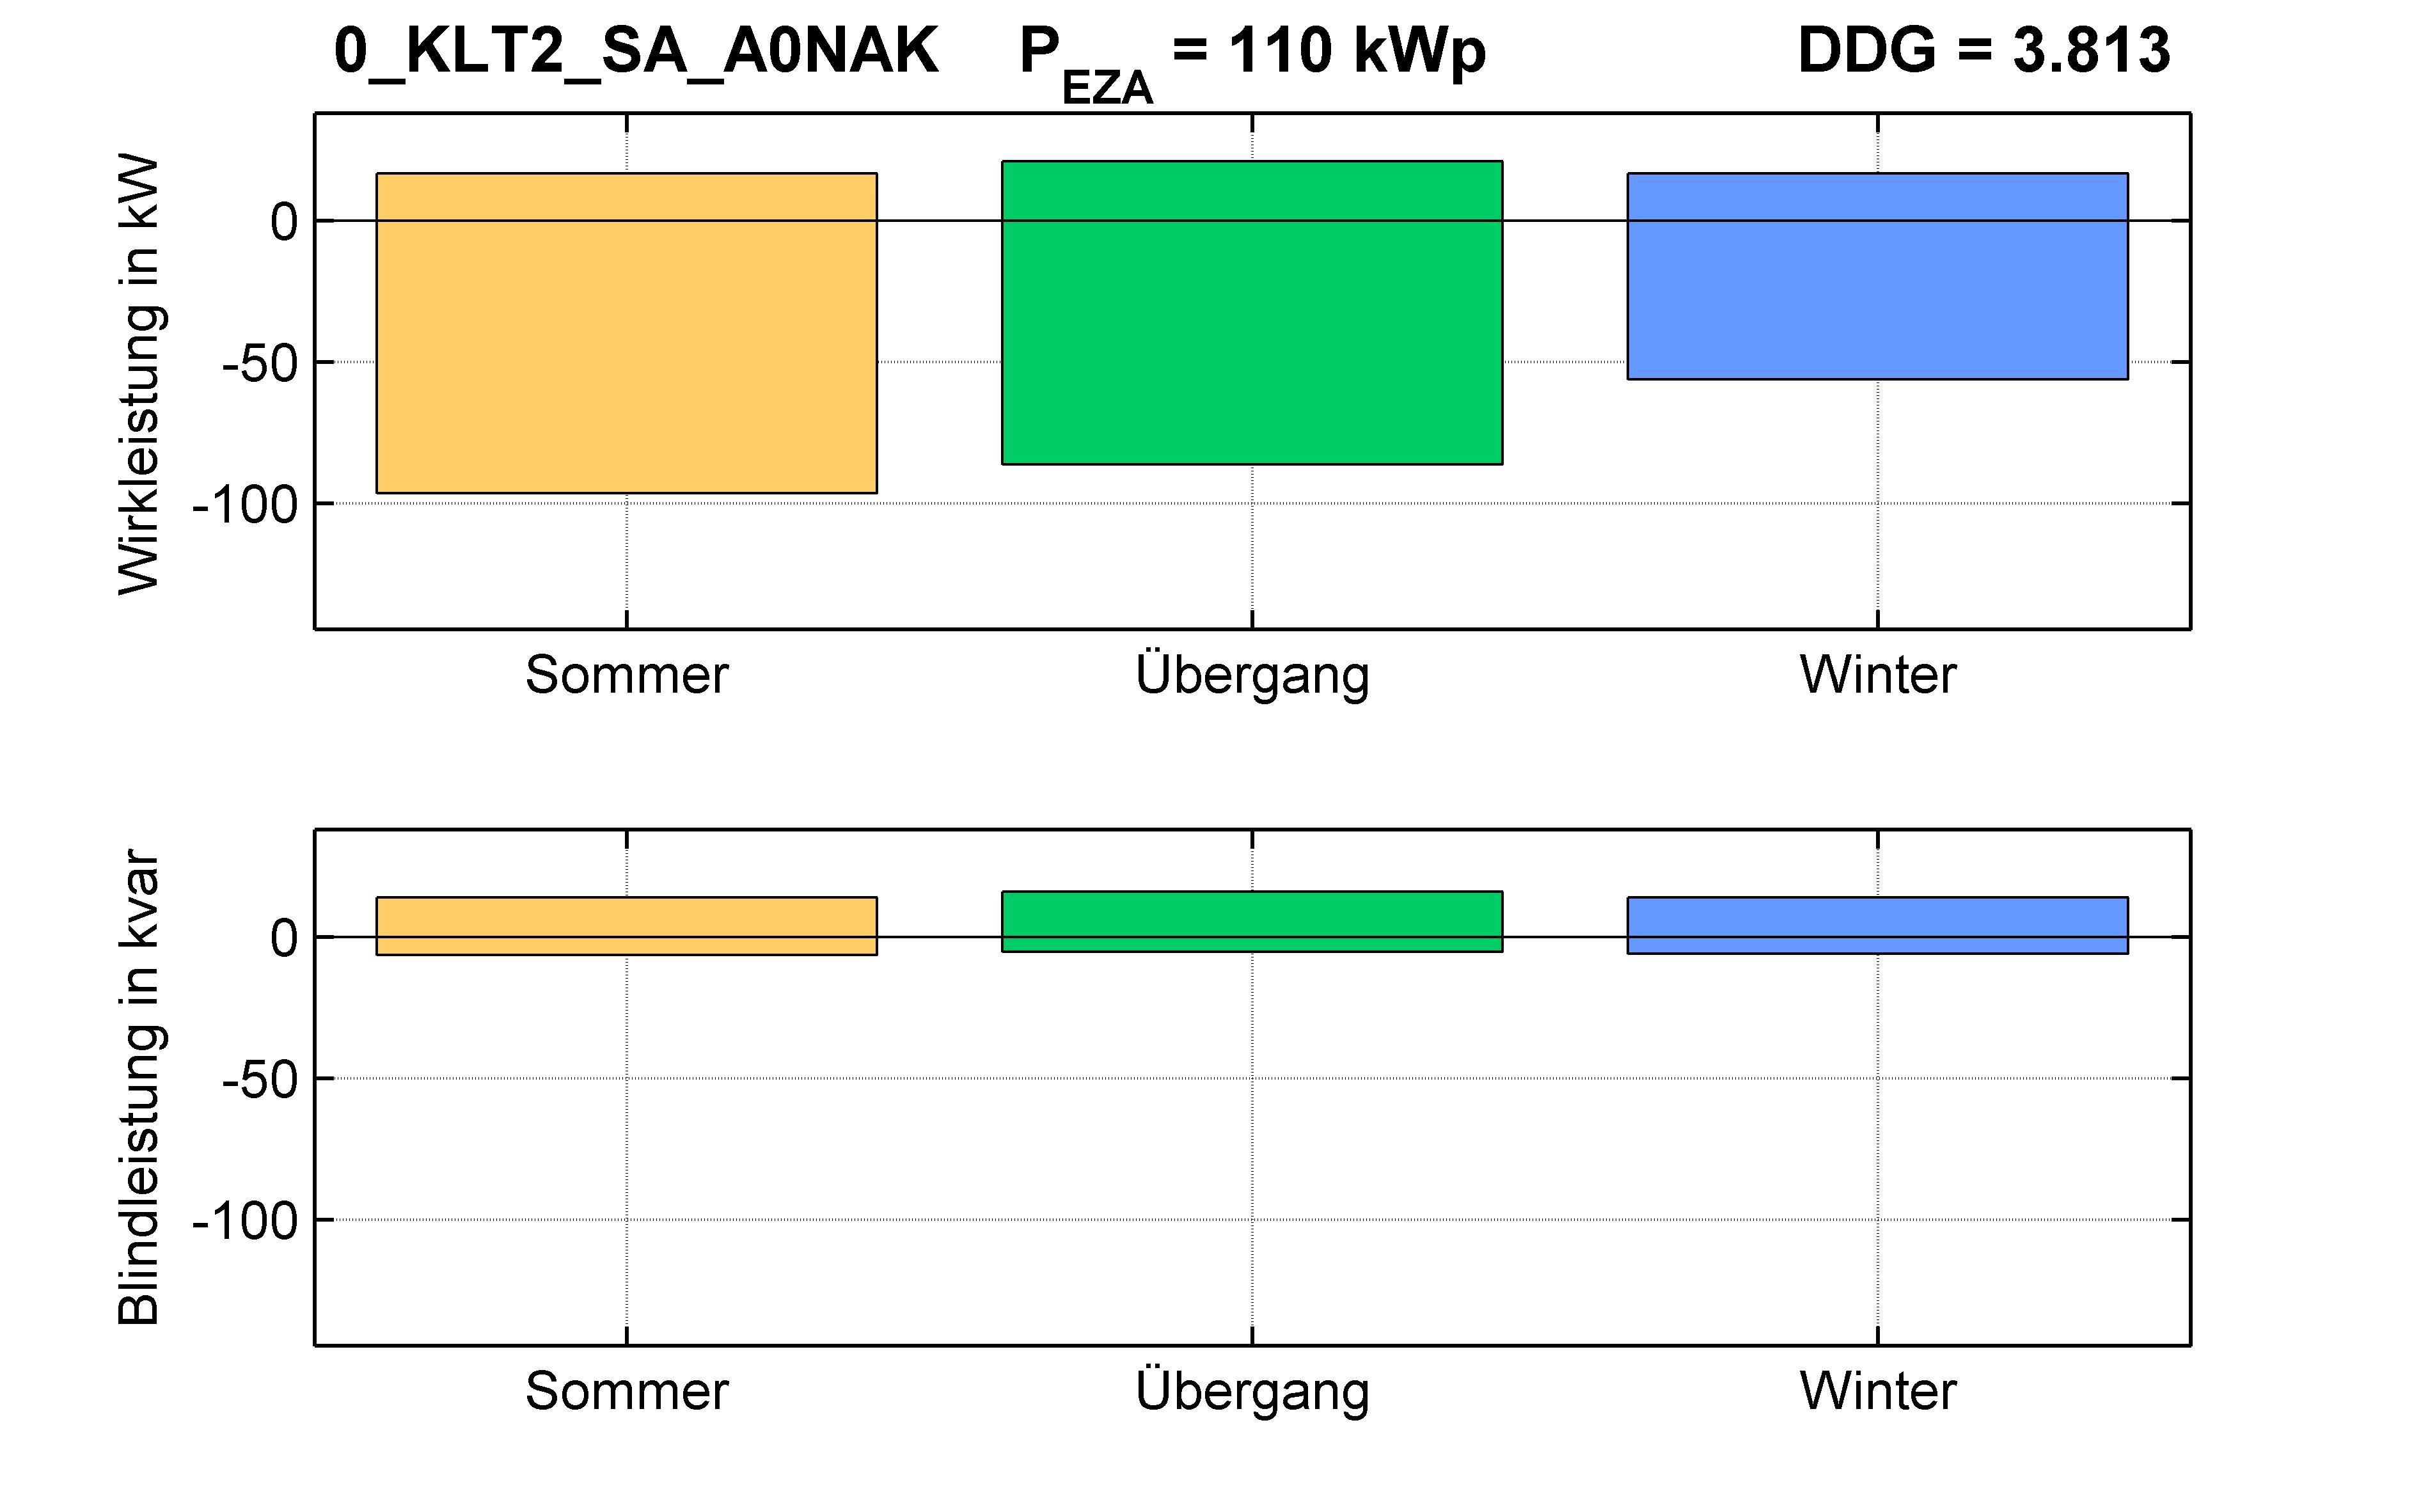 KLT2 | RONT (SA) A0NAK | PQ-Bilanz